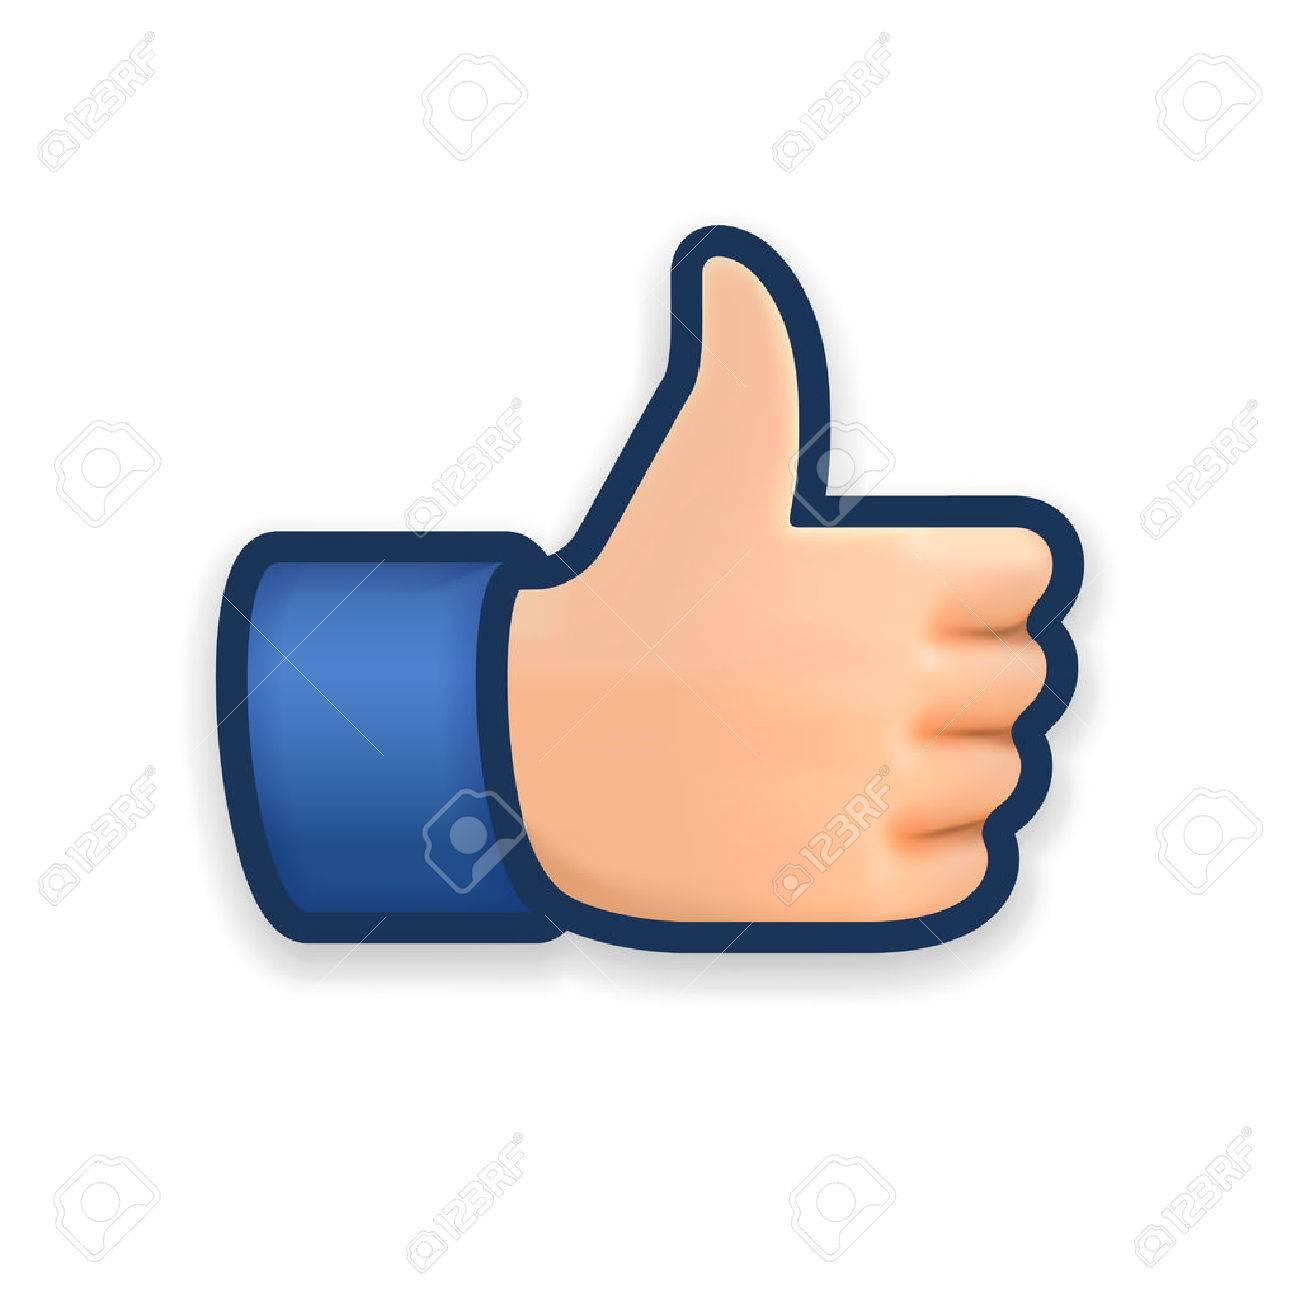 Like icon, thumb up symbol, vector illustration. Standard-Bild - 49477440